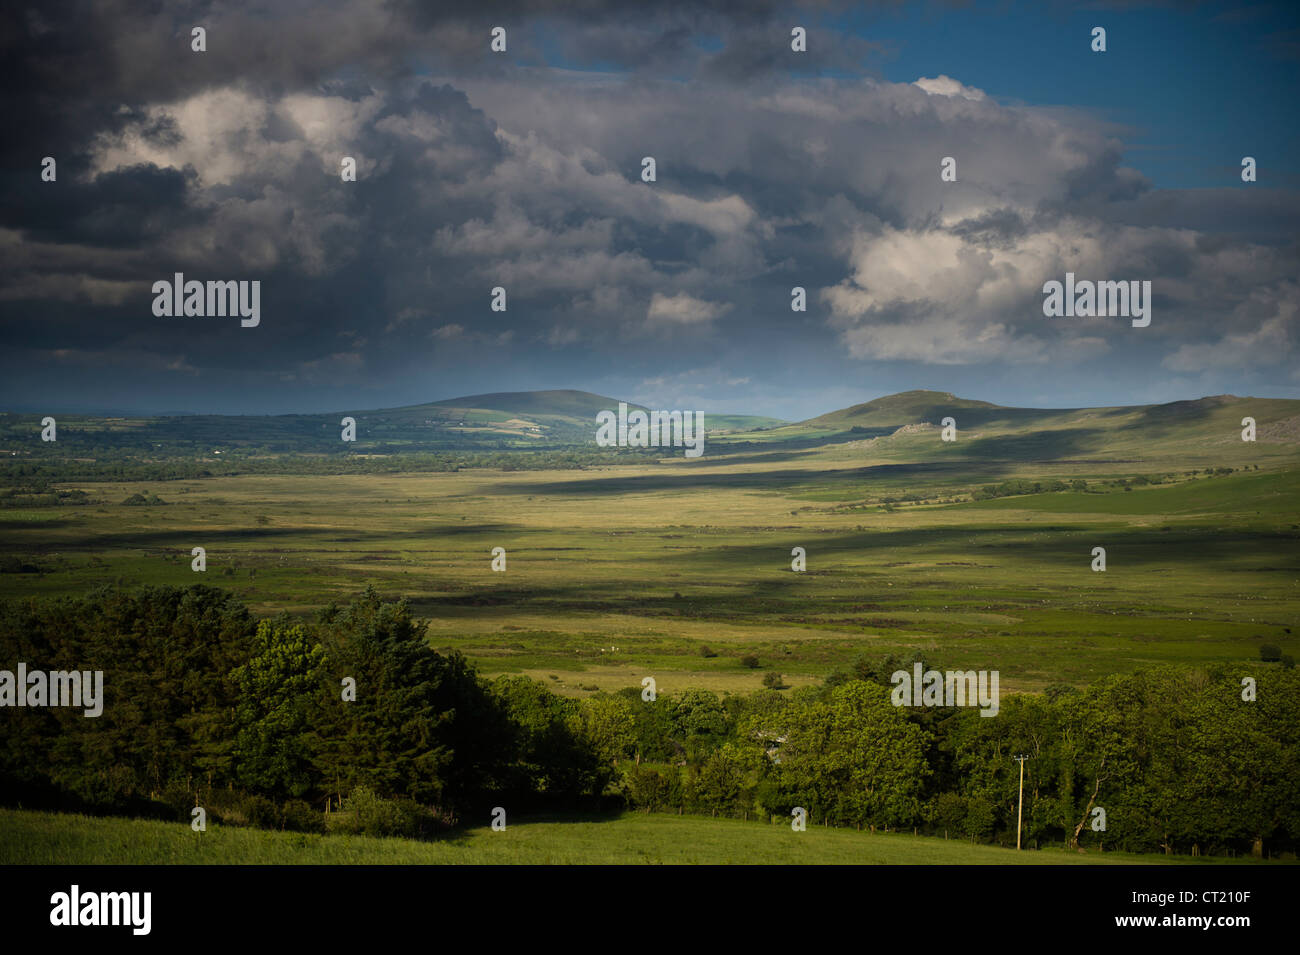 The Preseli hills, Pembrokeshire Wales UK - Stock Image